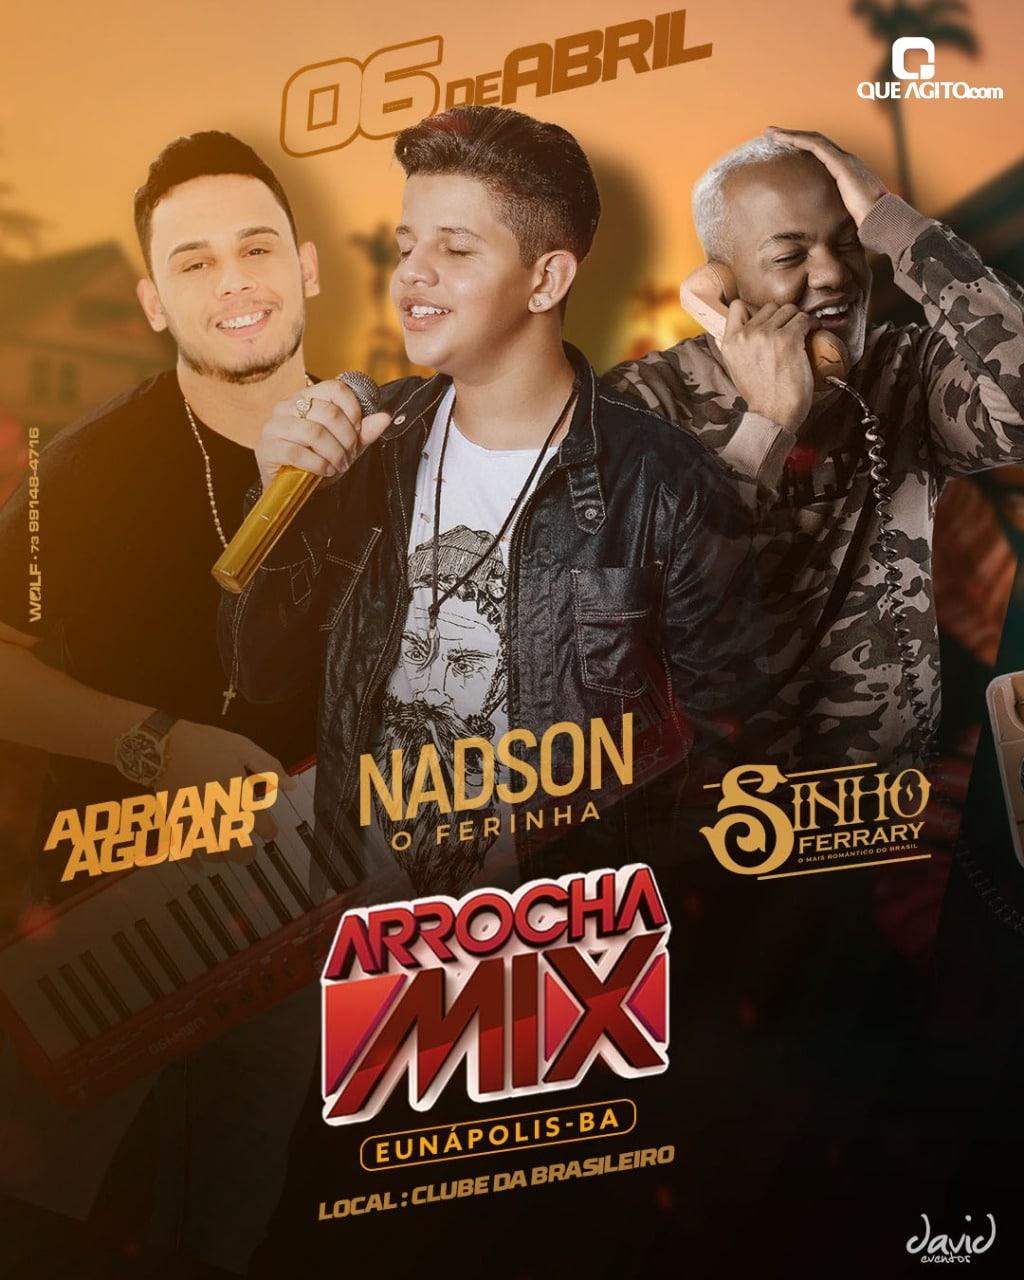 Arrocha Mix com Nadson, Sinho Ferrary, Adriano Aguiar - Eunápolis-BA 1